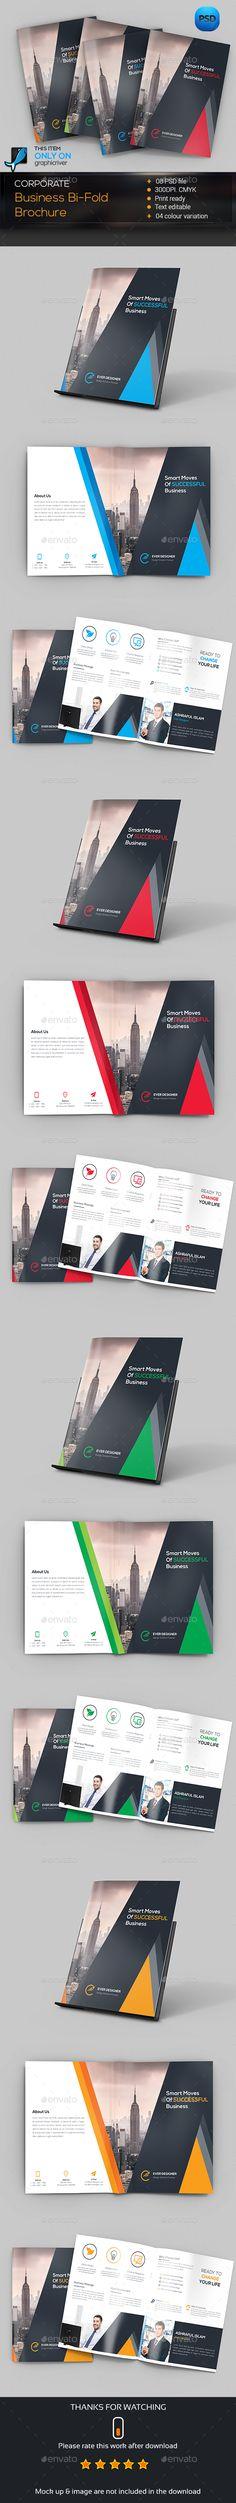 Corporate Bifold Brochure Template PSD #design Download: http://graphicriver.net/item/corporate-bifold-brochure/14274564?ref=ksioks